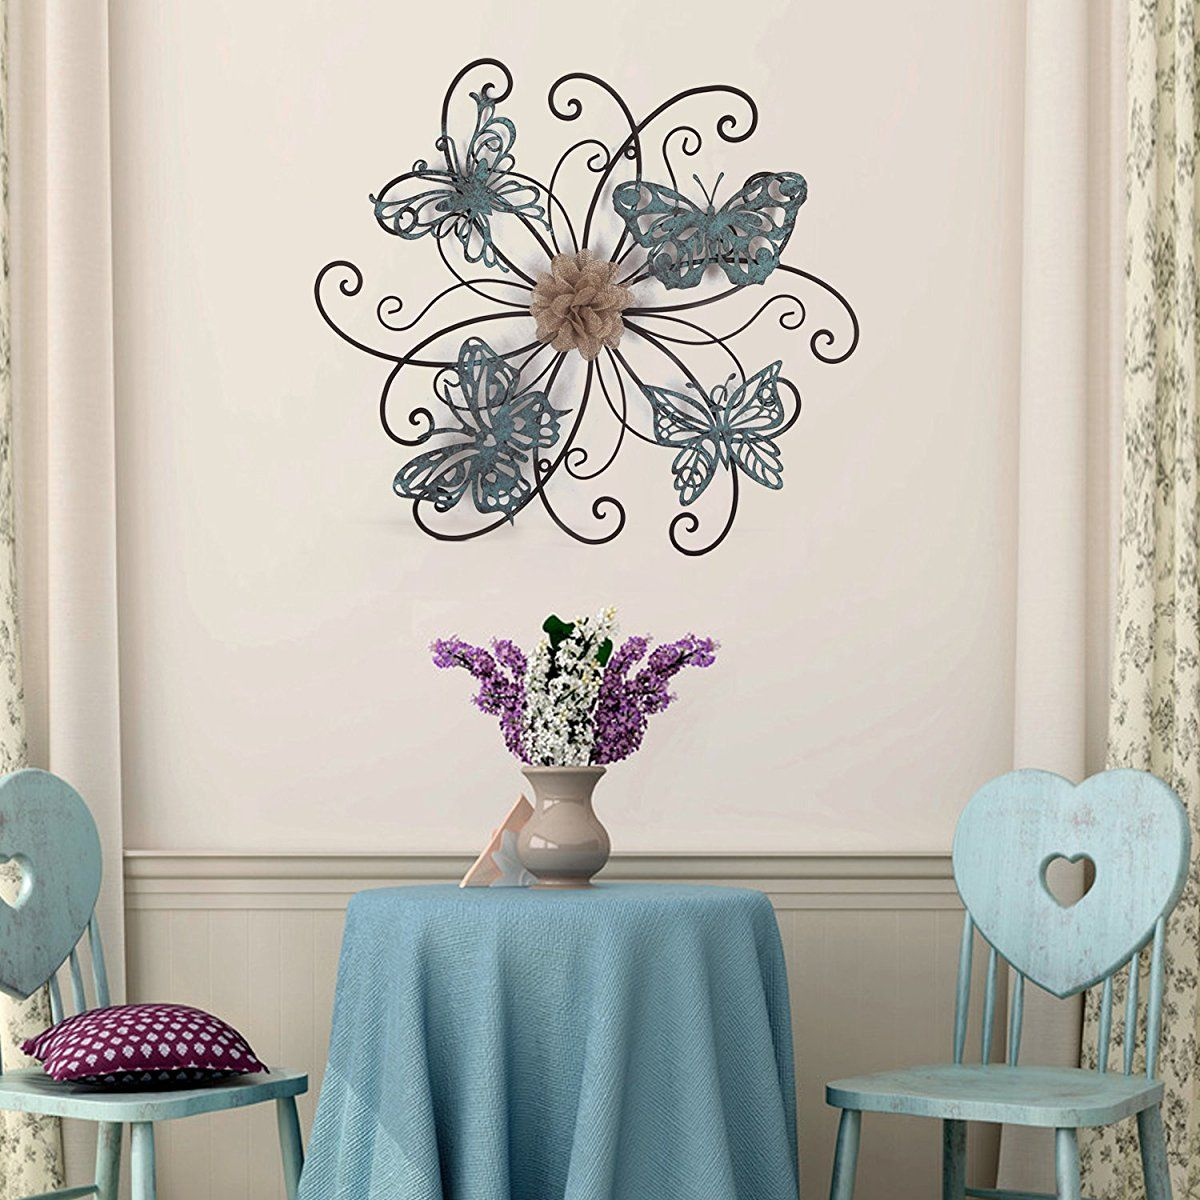 Favorite Homes Art Flower And Butterfly Urban Design Metal Wall Decor For inside Raheem Flowers Metal Wall Decor